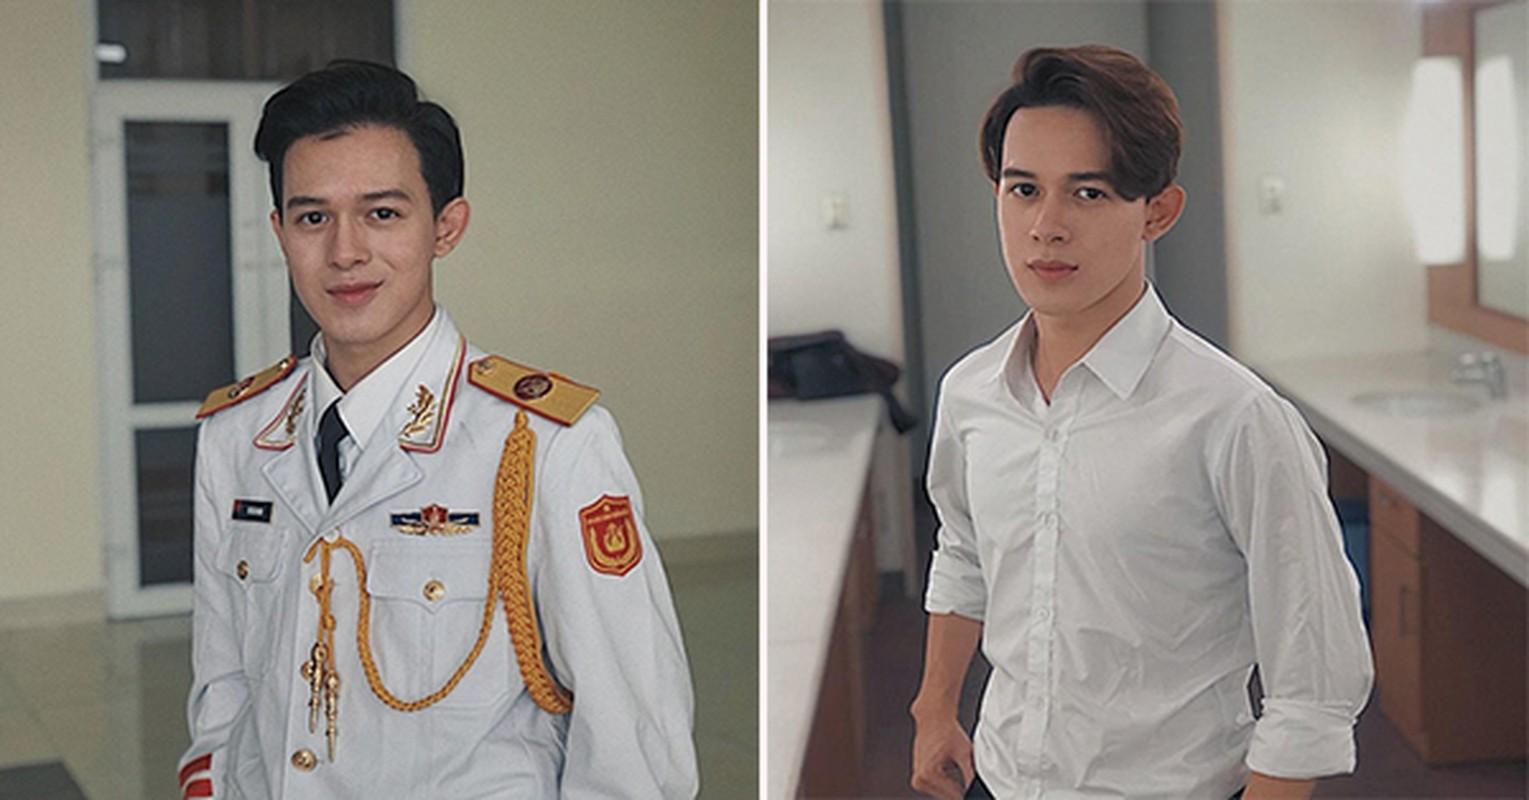 Loat hot boy, hot girl cham moc 20 tuoi nhung da thanh cong-Hinh-6